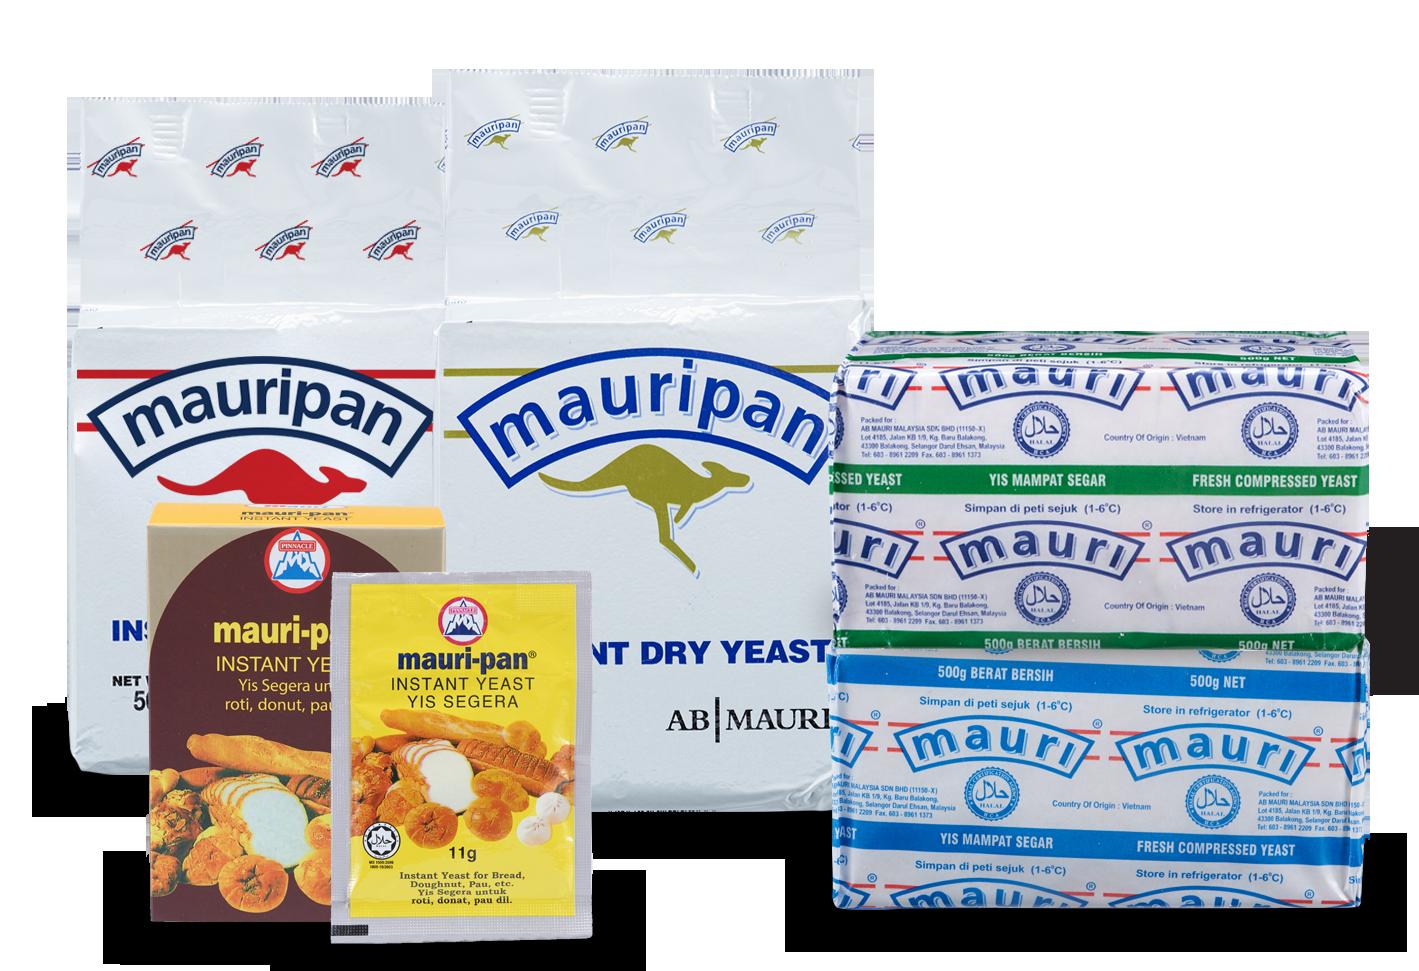 AB Mauri Products